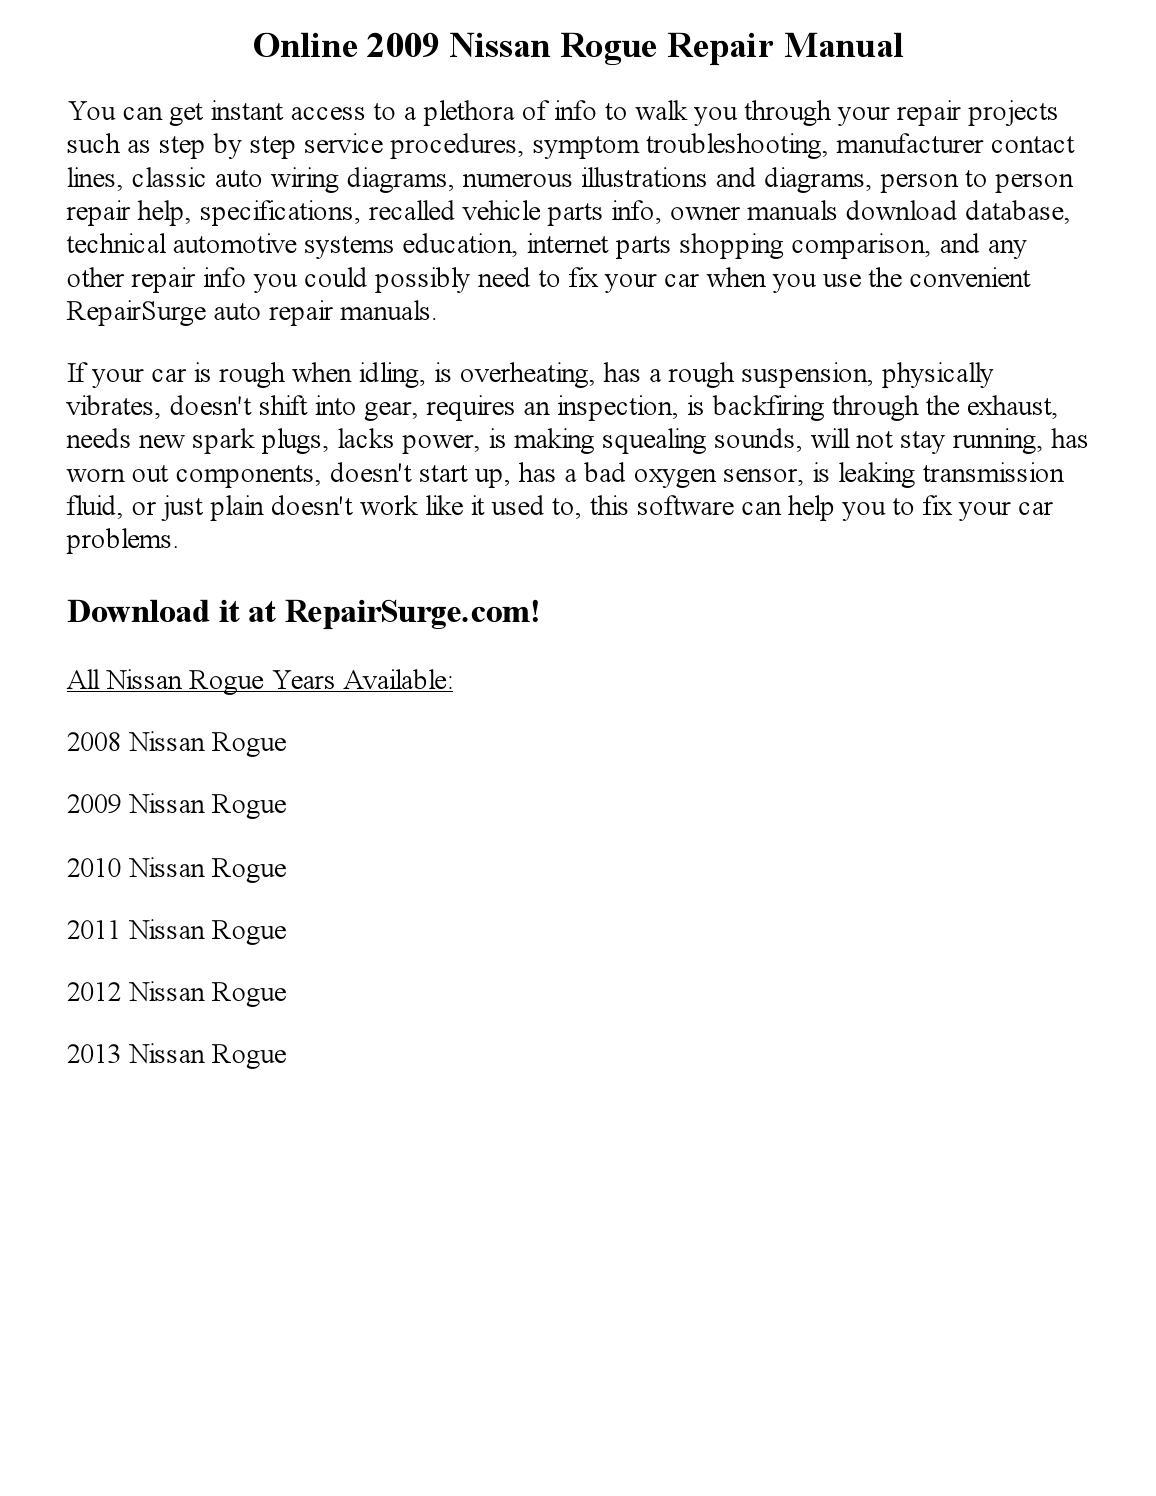 2009 Nissan Rogue Service Manual